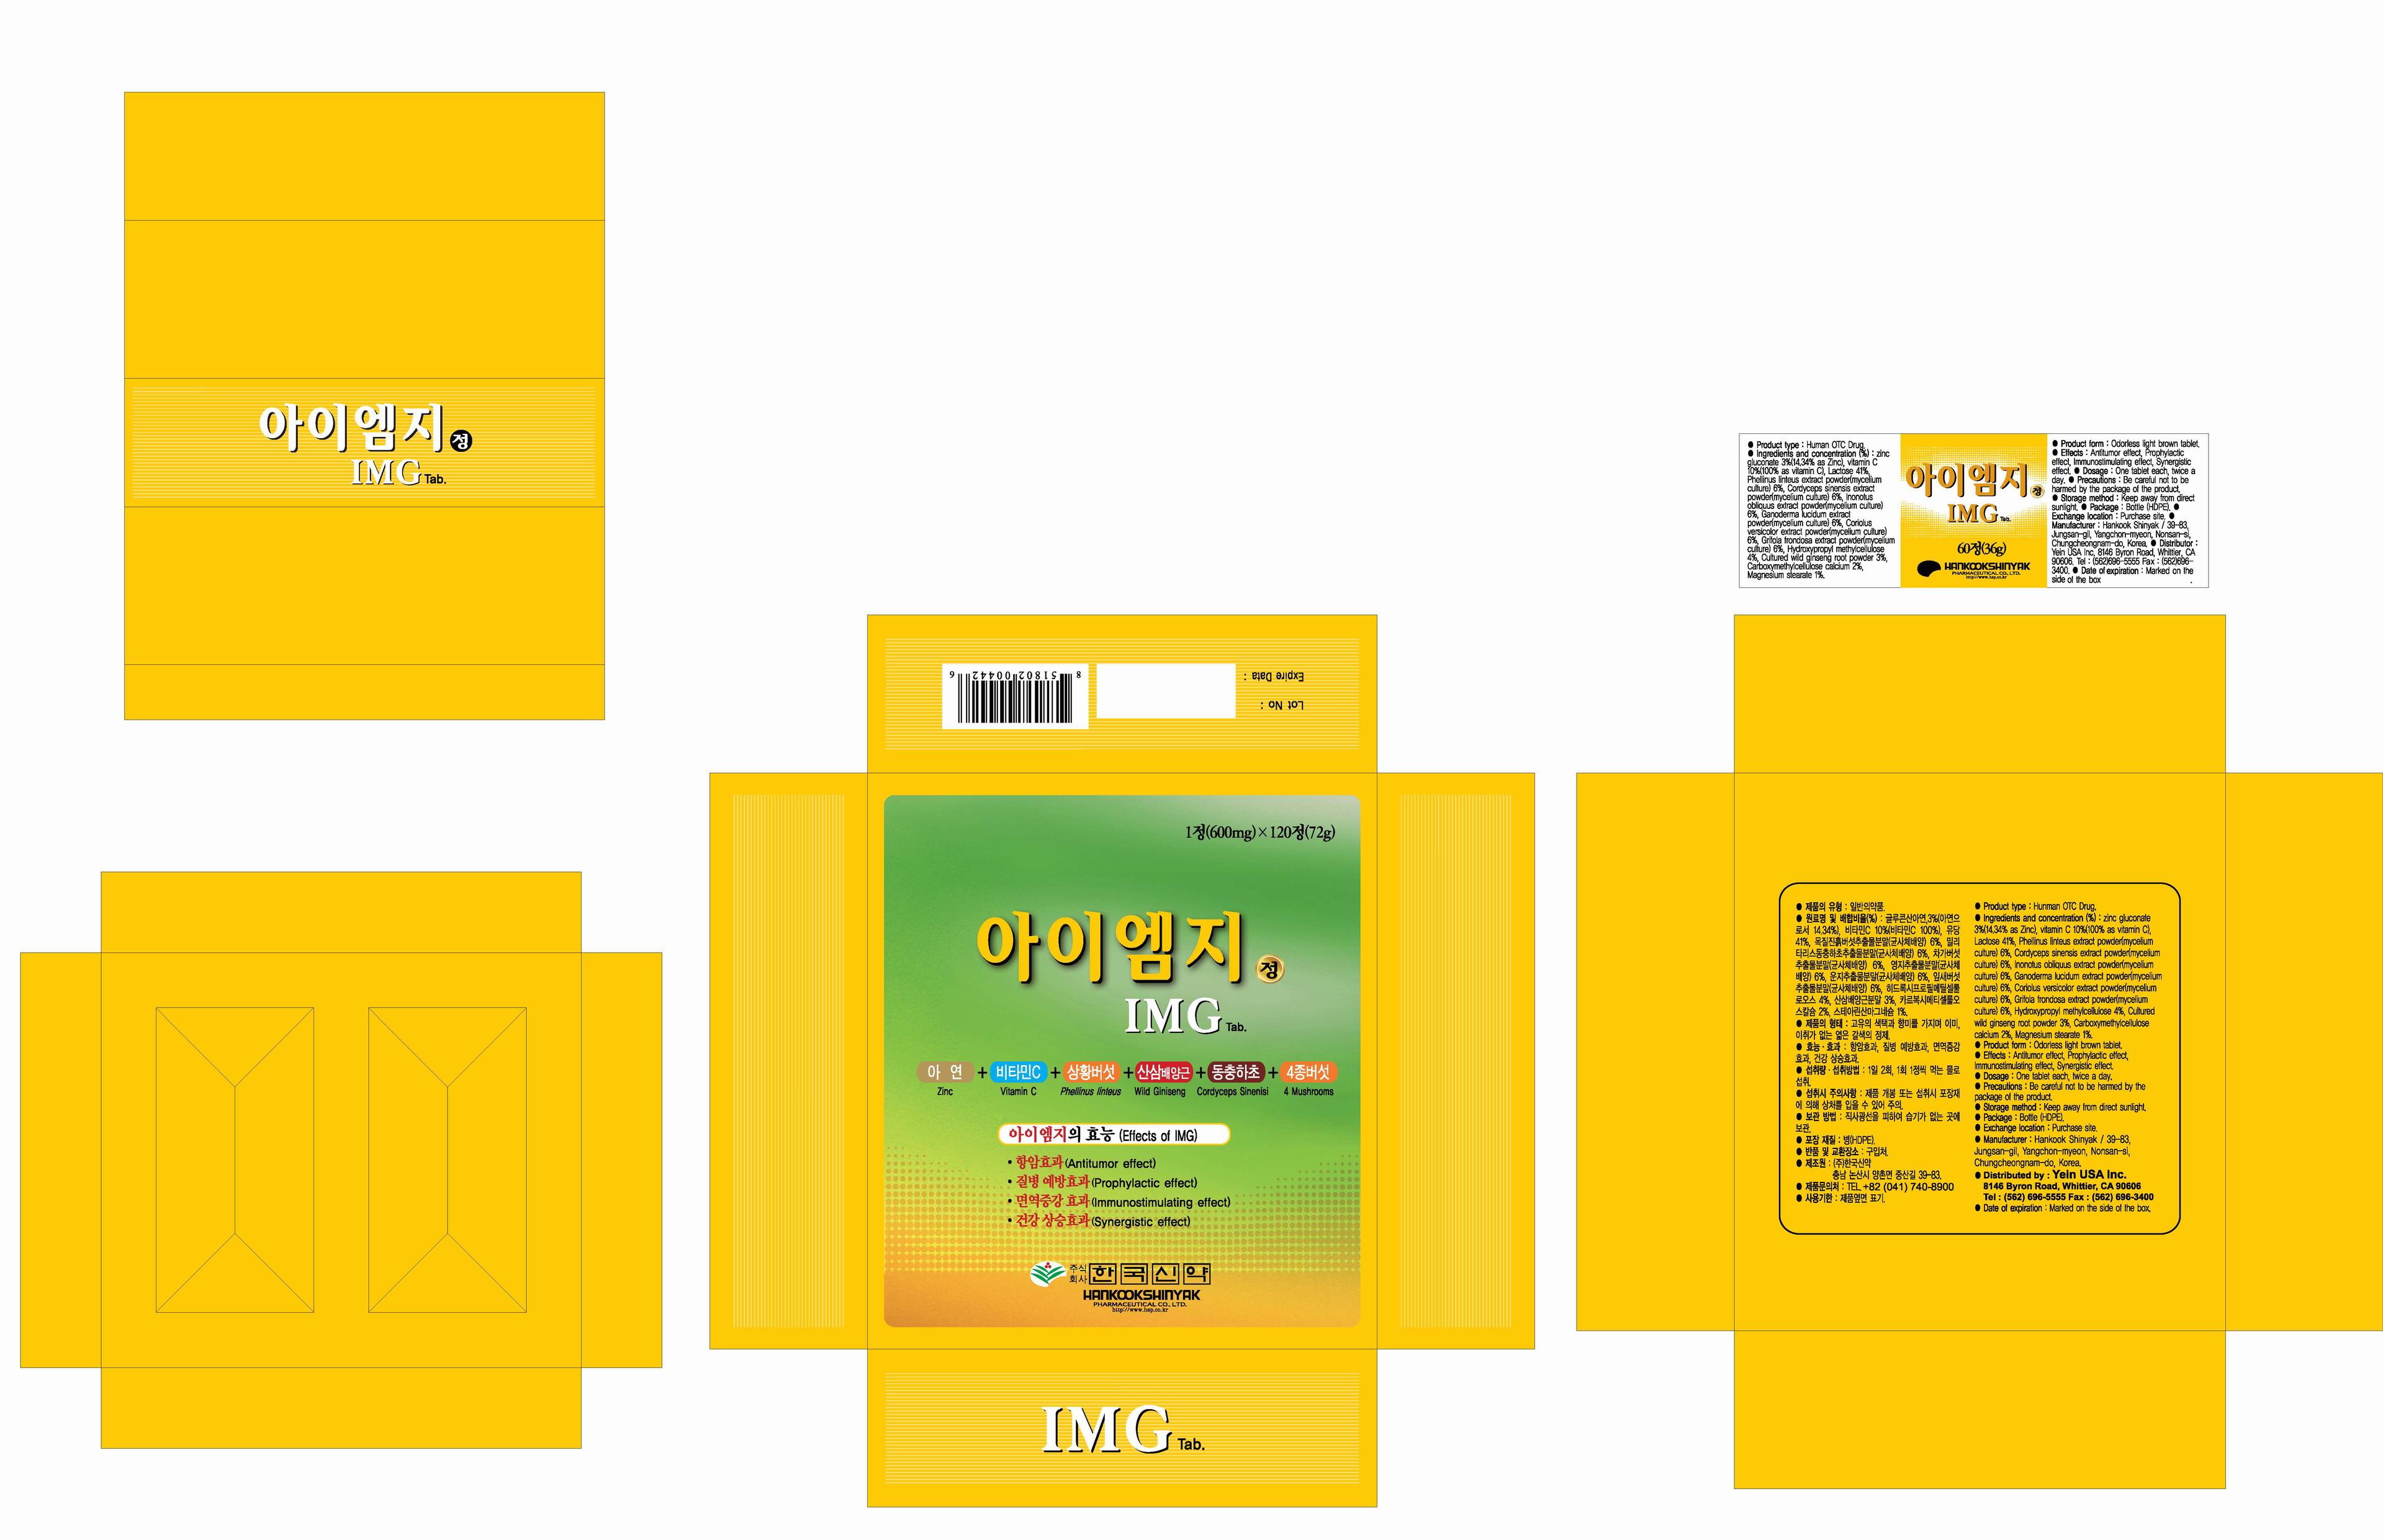 Img (Phellinus Linteus Mycelium) Tablet [Yein Trading & Global Co., Ltd]